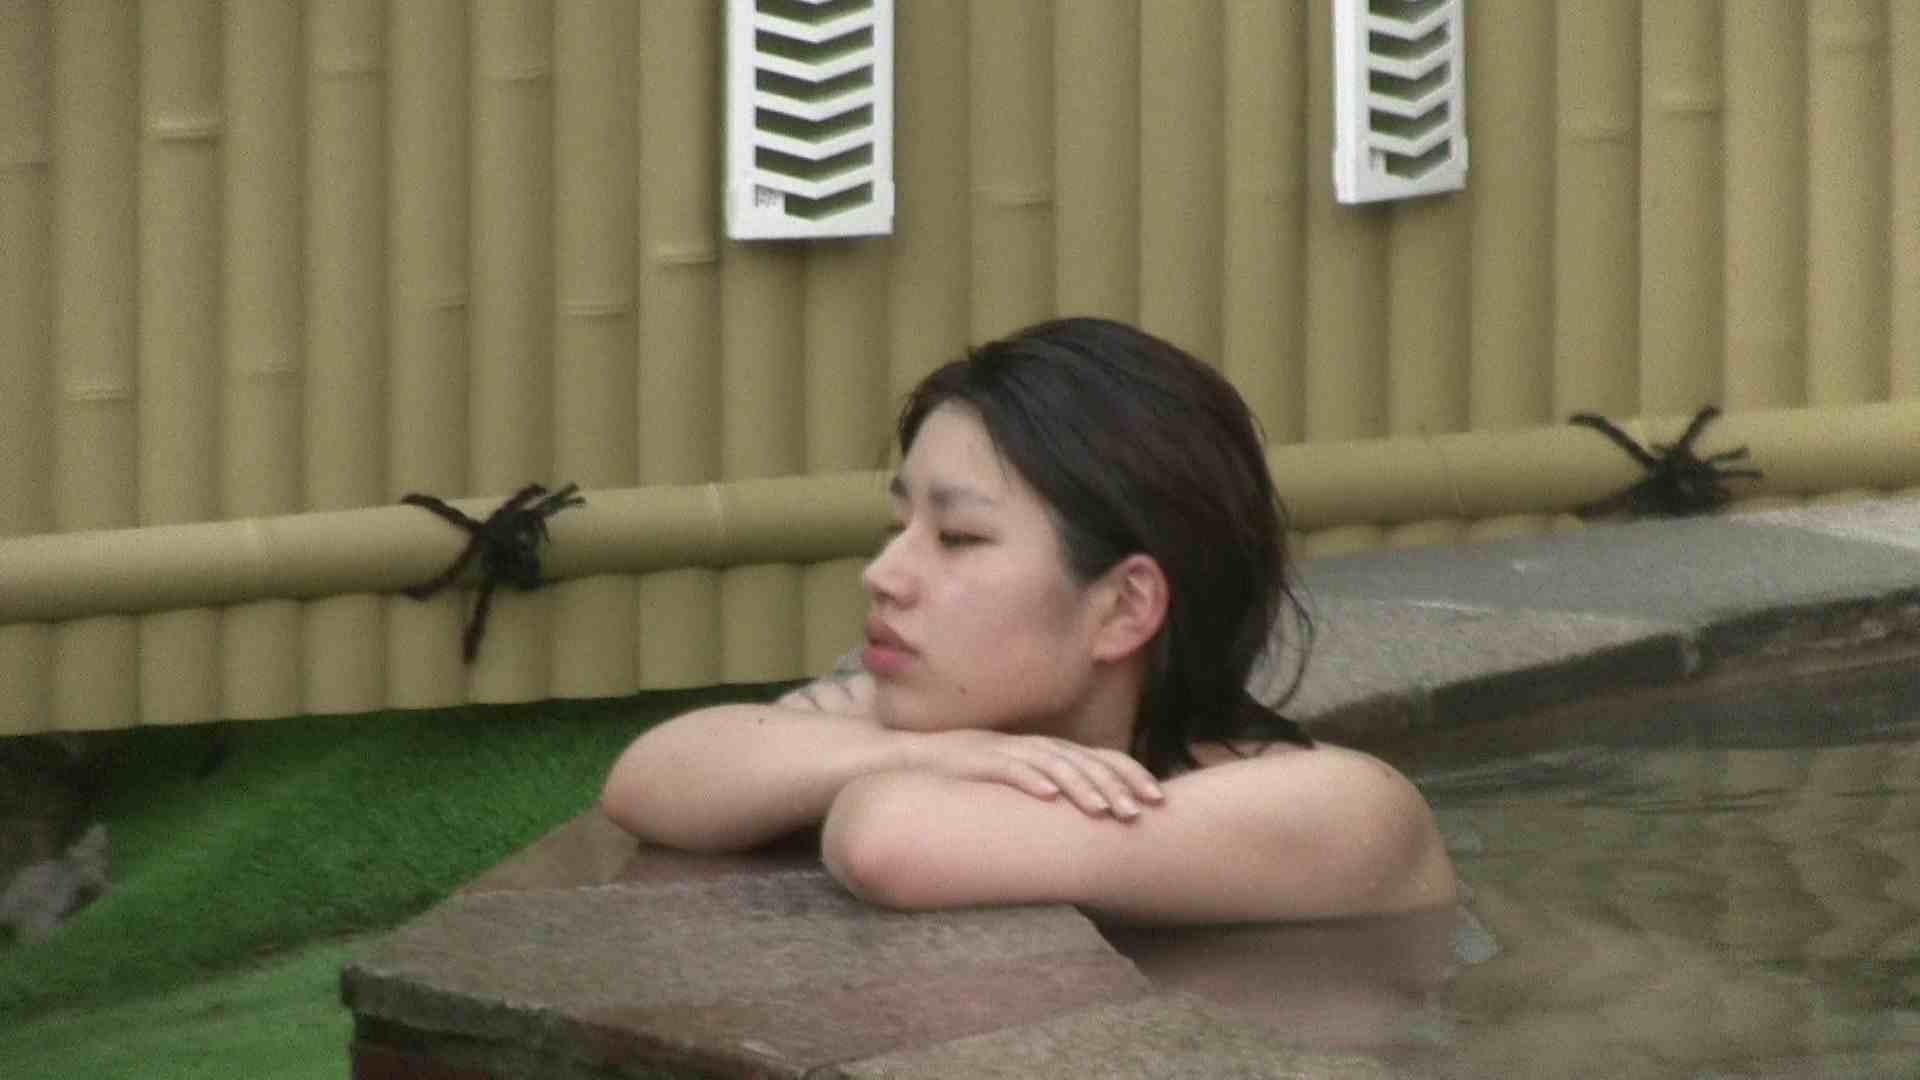 Aquaな露天風呂Vol.230 HなOL | 盗撮  83pic 22